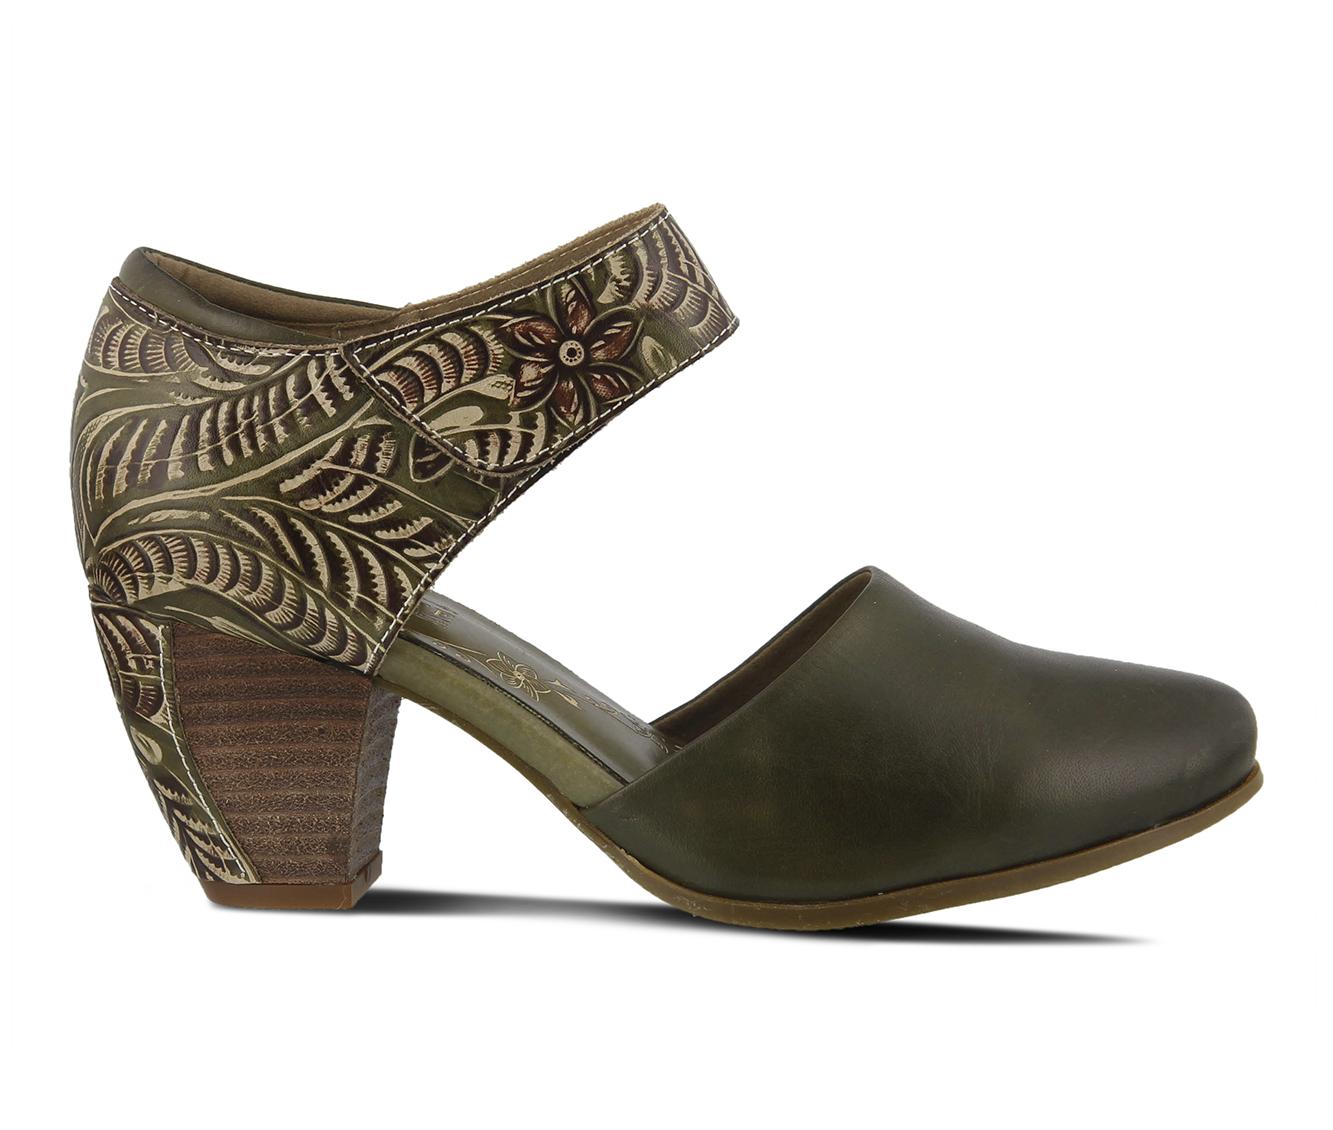 L'Artiste Toolie Women's Dress Shoe (Green Leather)